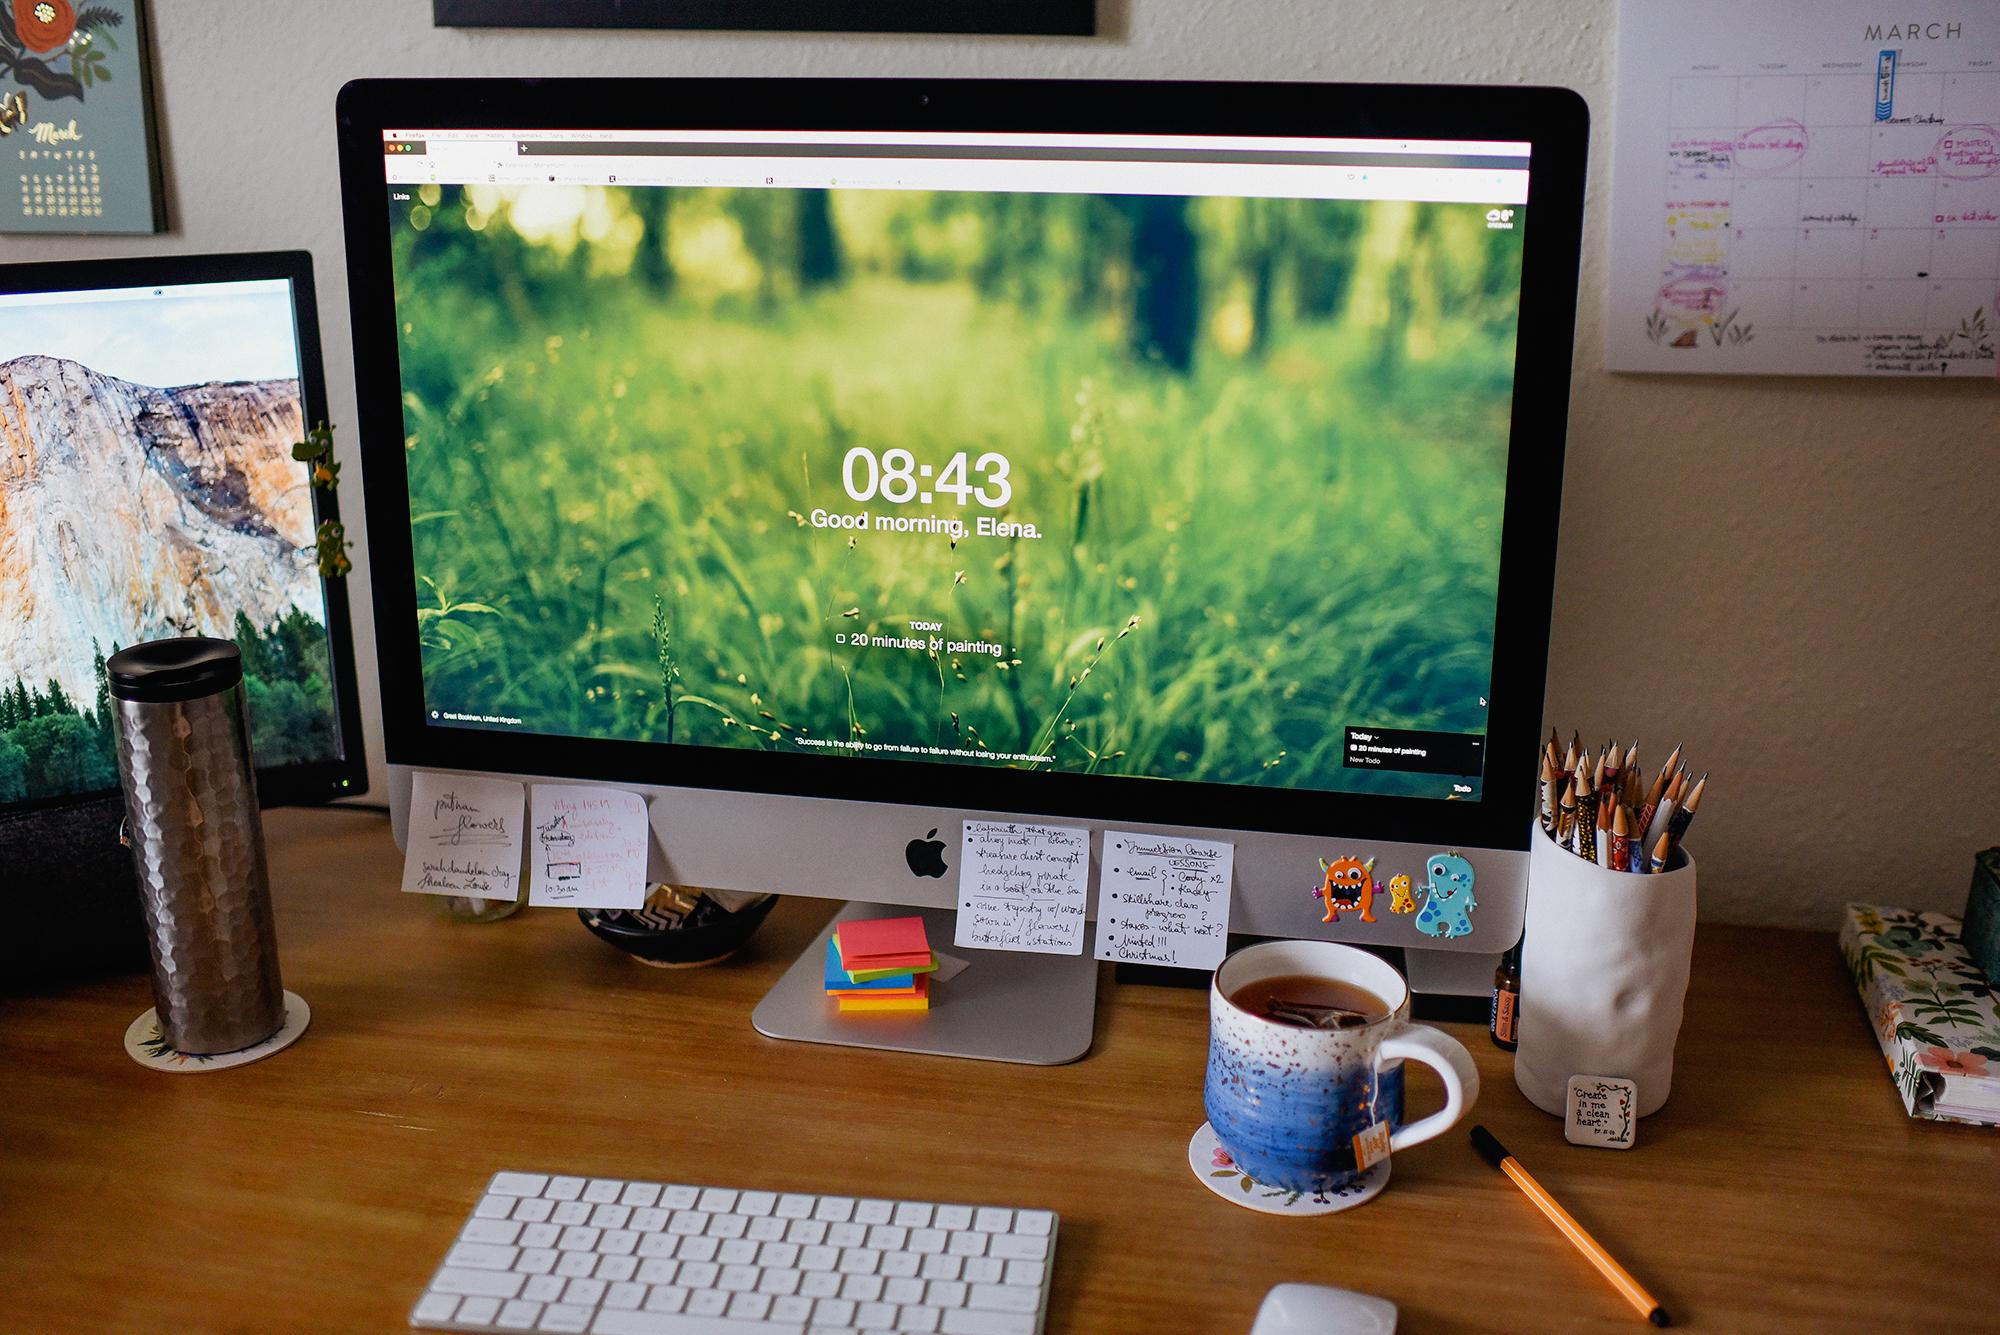 work-space-momentum-browser-add-on.jpg